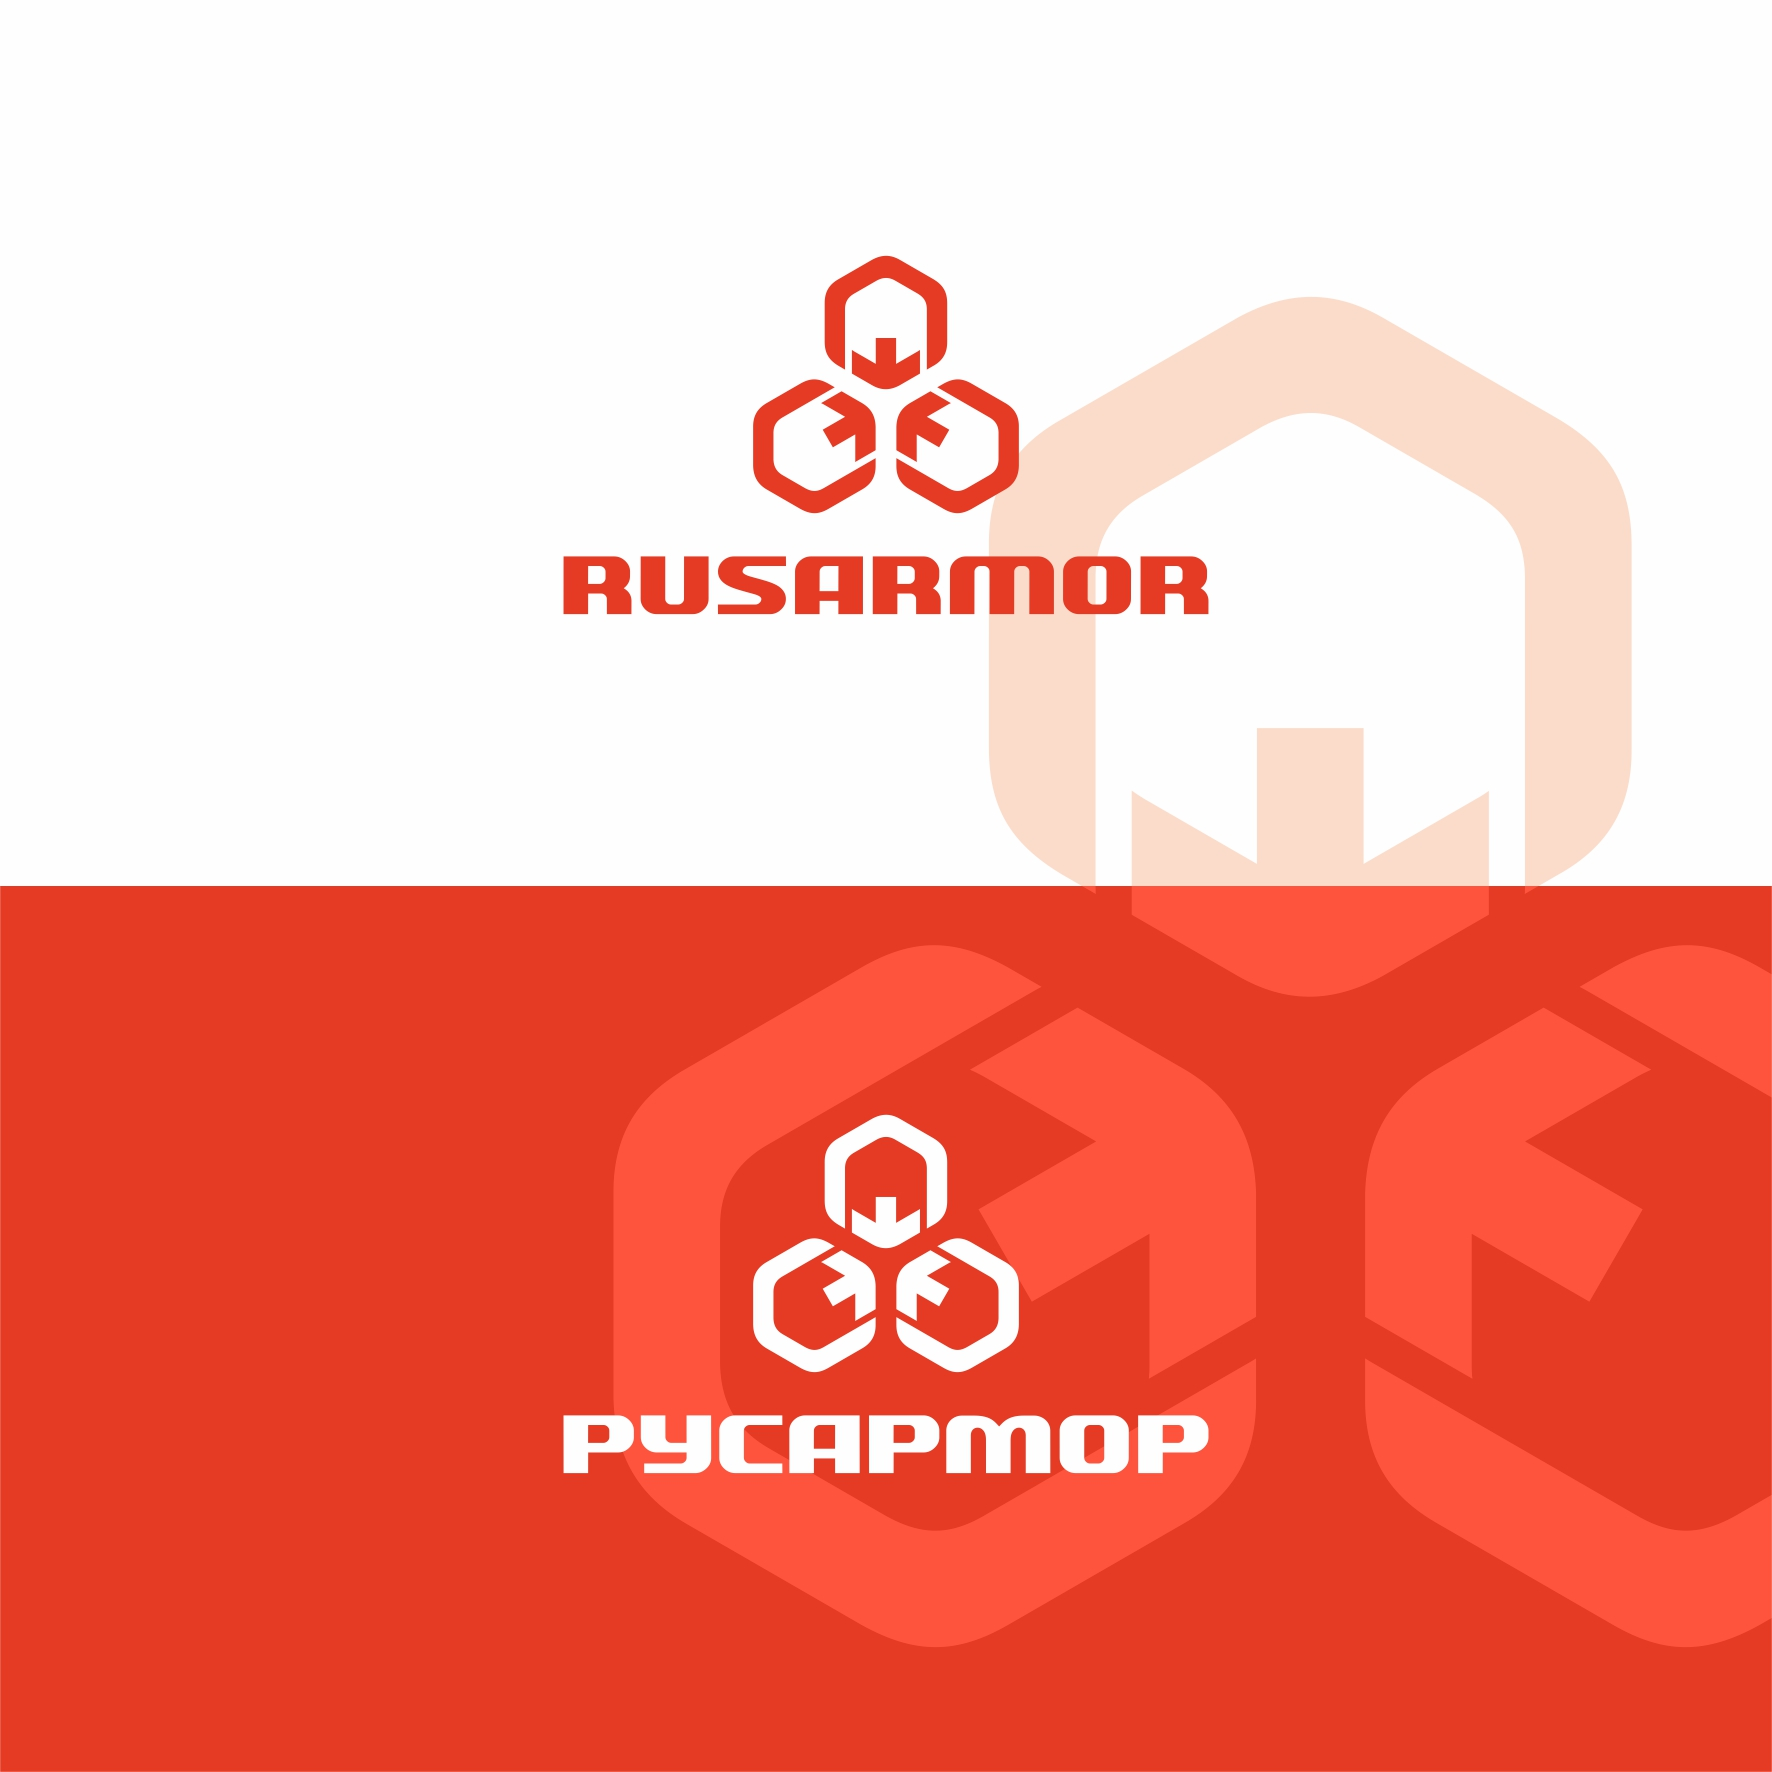 Разработка логотипа технологического стартапа РУСАРМОР фото f_8175a0958308acce.jpg